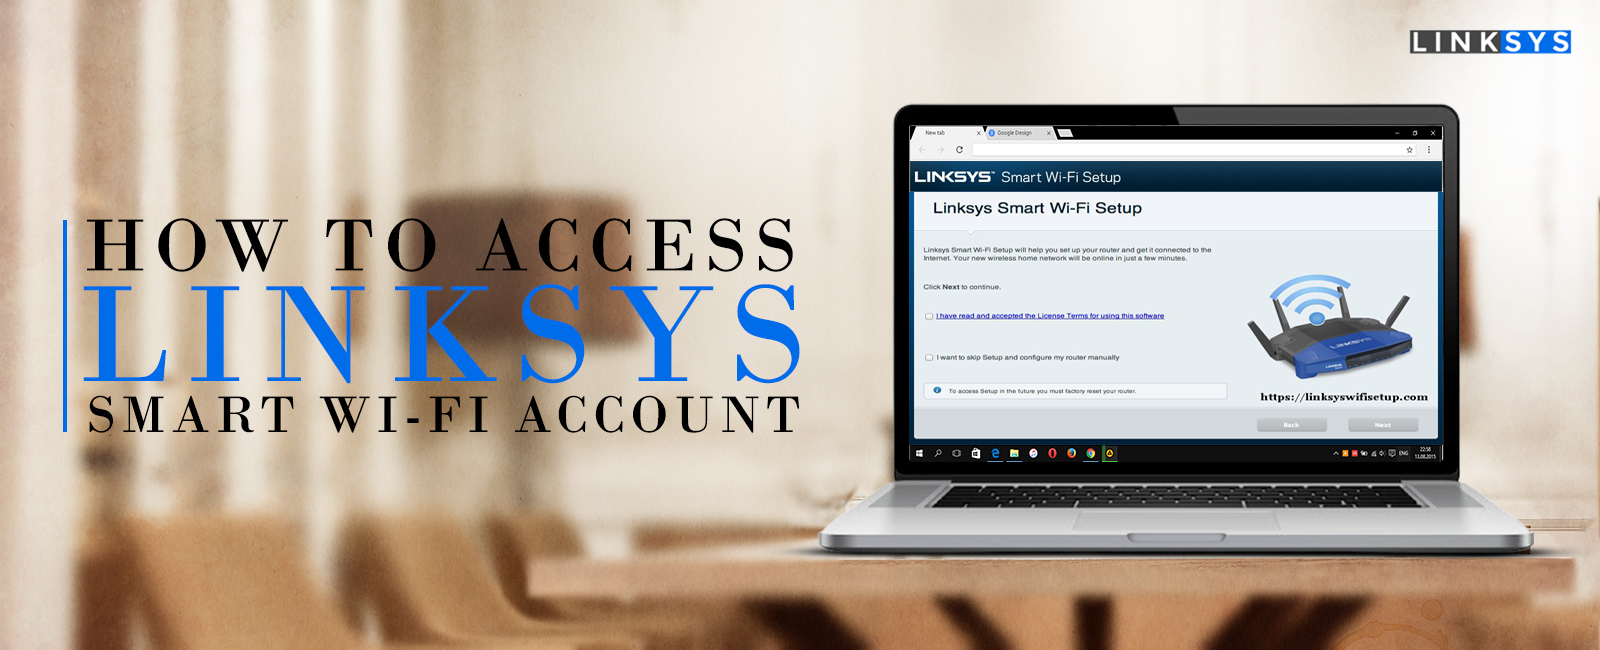 Linksys Smart Wi-Fi Account